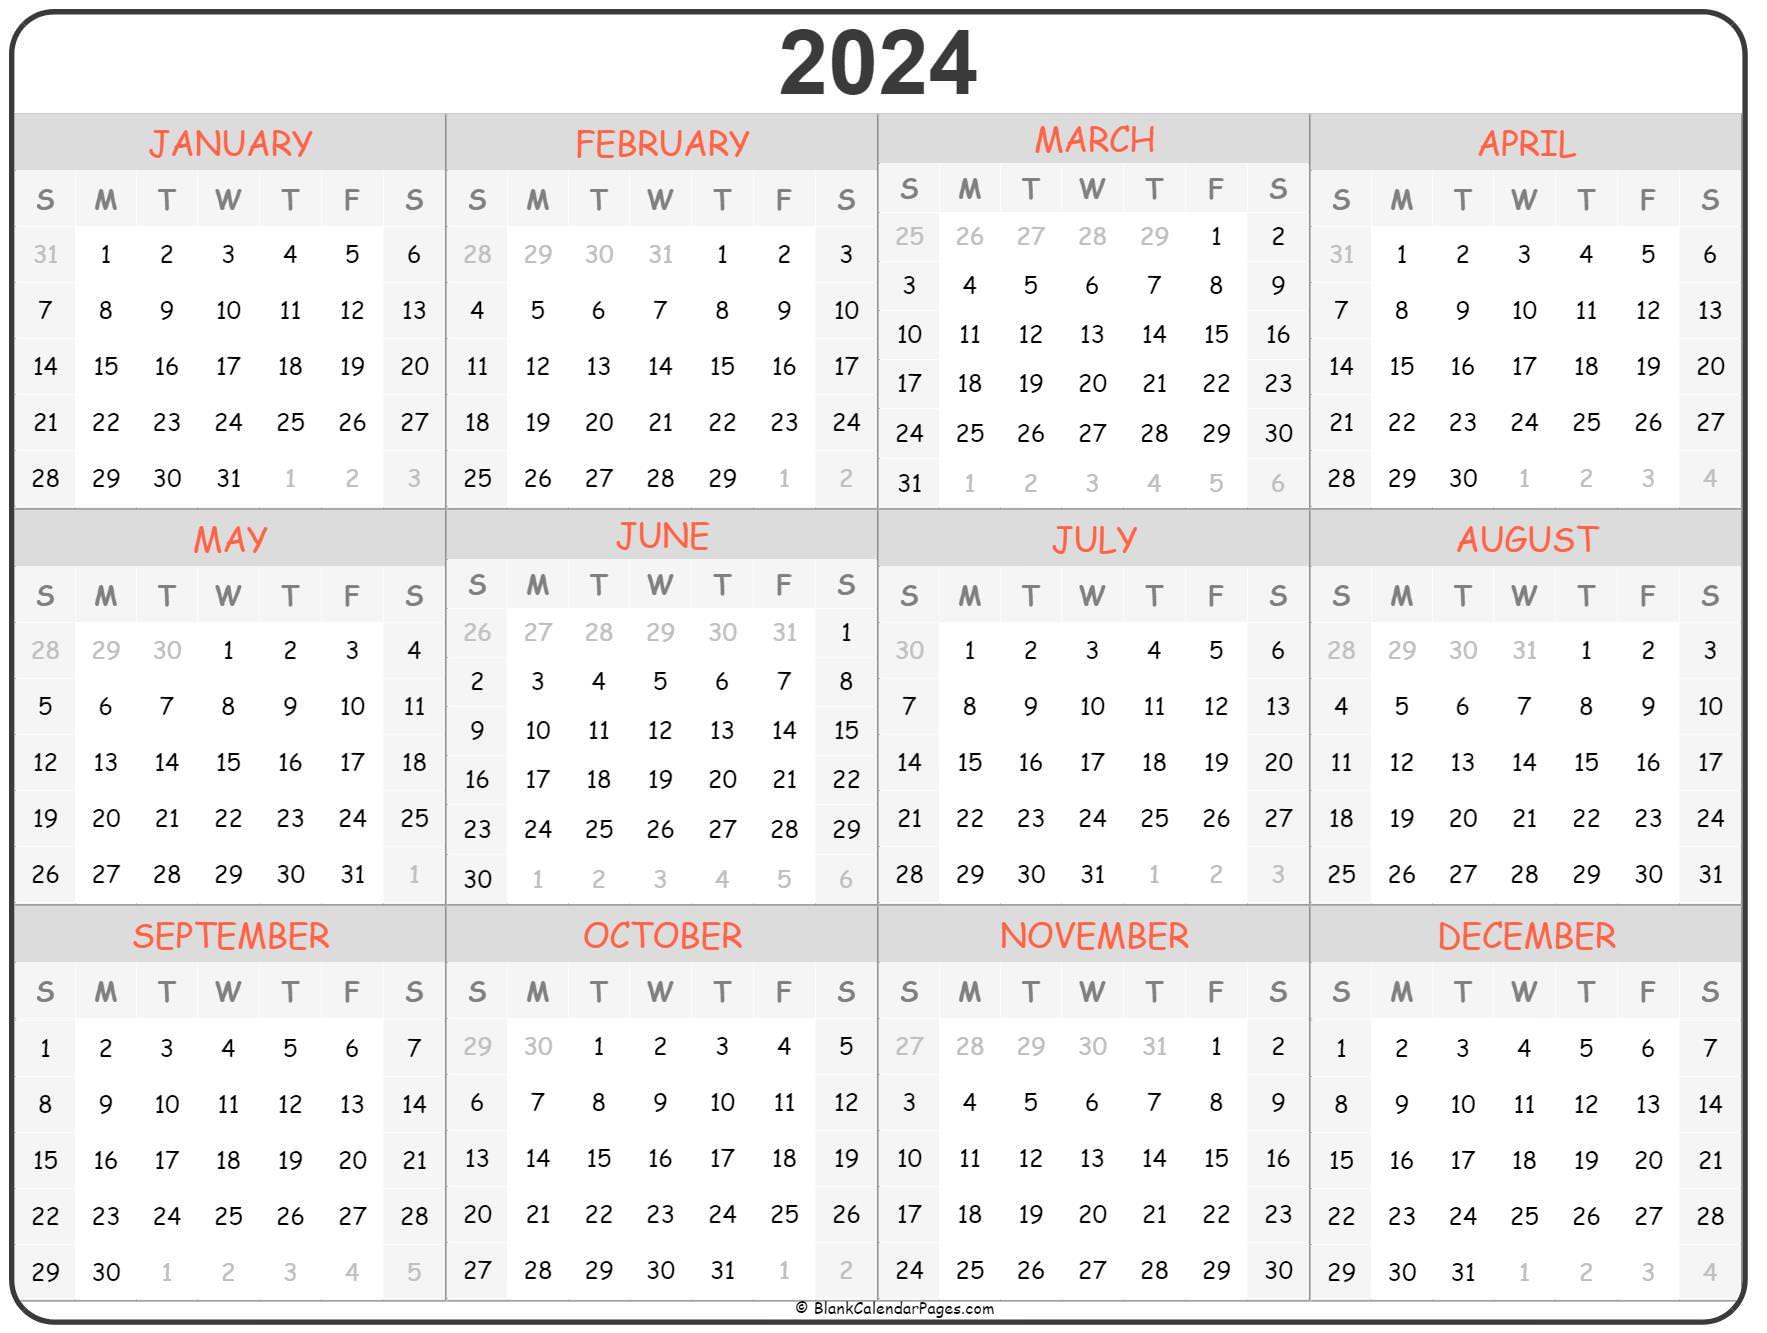 2024 year calendar